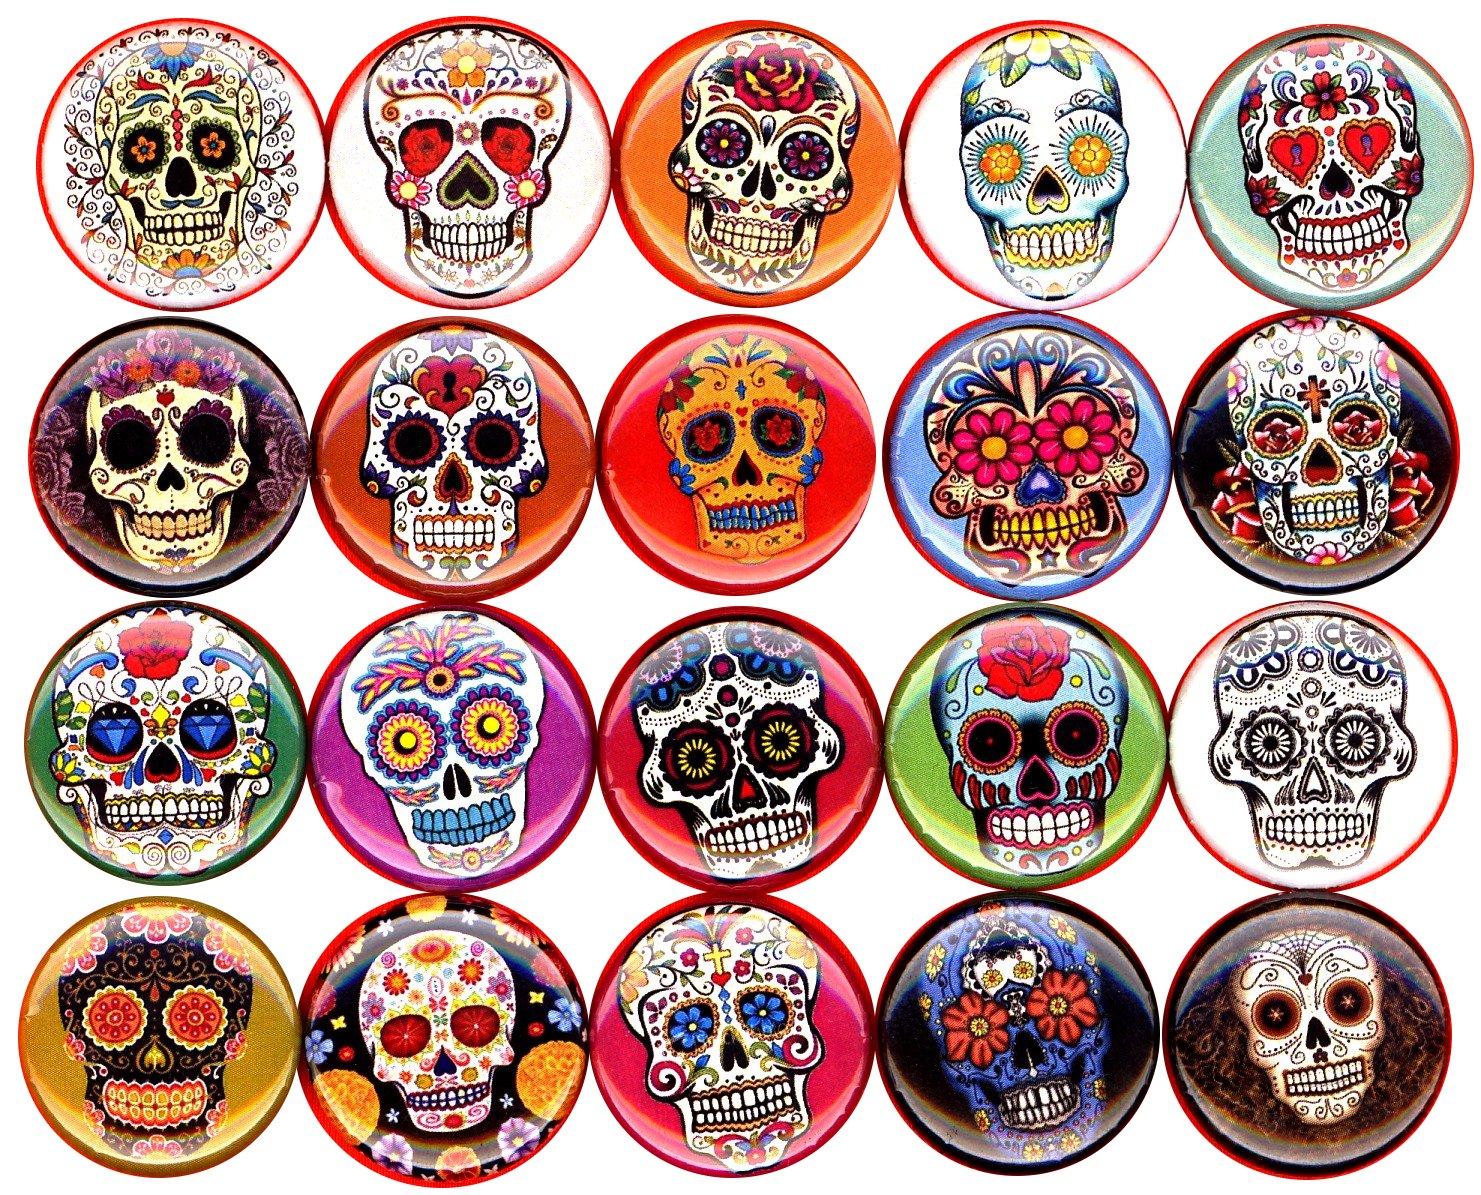 Sugar Skulls x 20 NEW 1'' inch (25mm) buttons pins badges dia de los muertes day of the dead …